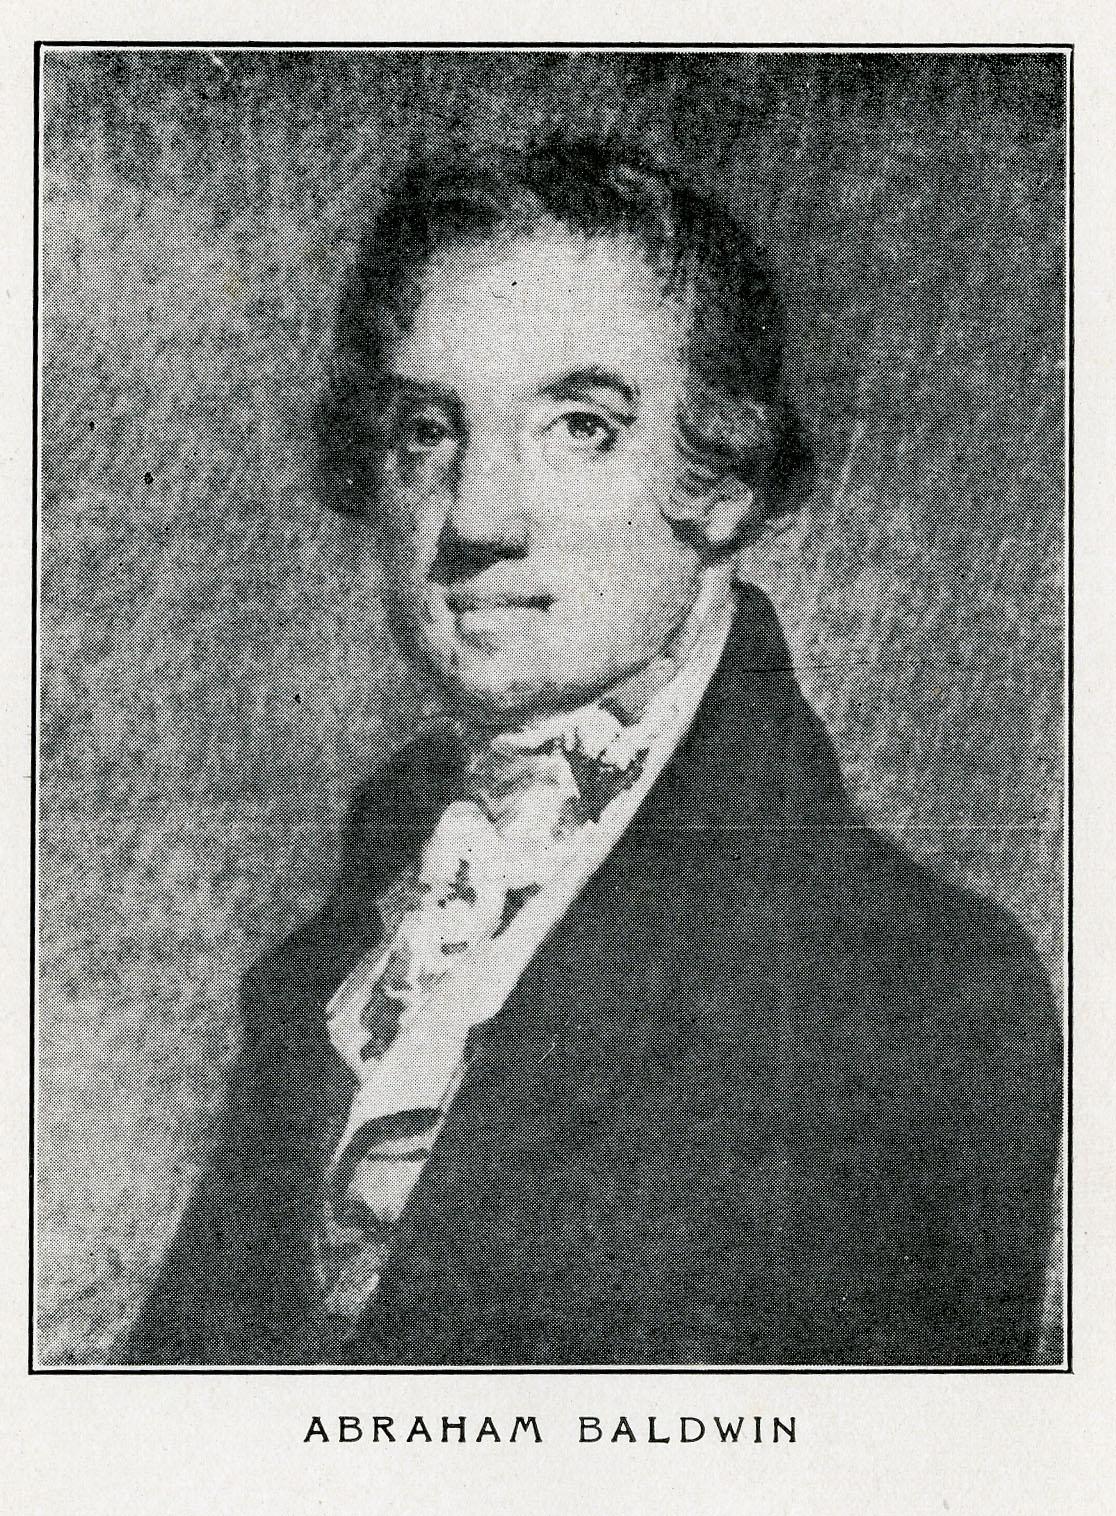 Abraham Baldwin Sketch. Georgia Historical Society Main Collection E302.6.B17 W5